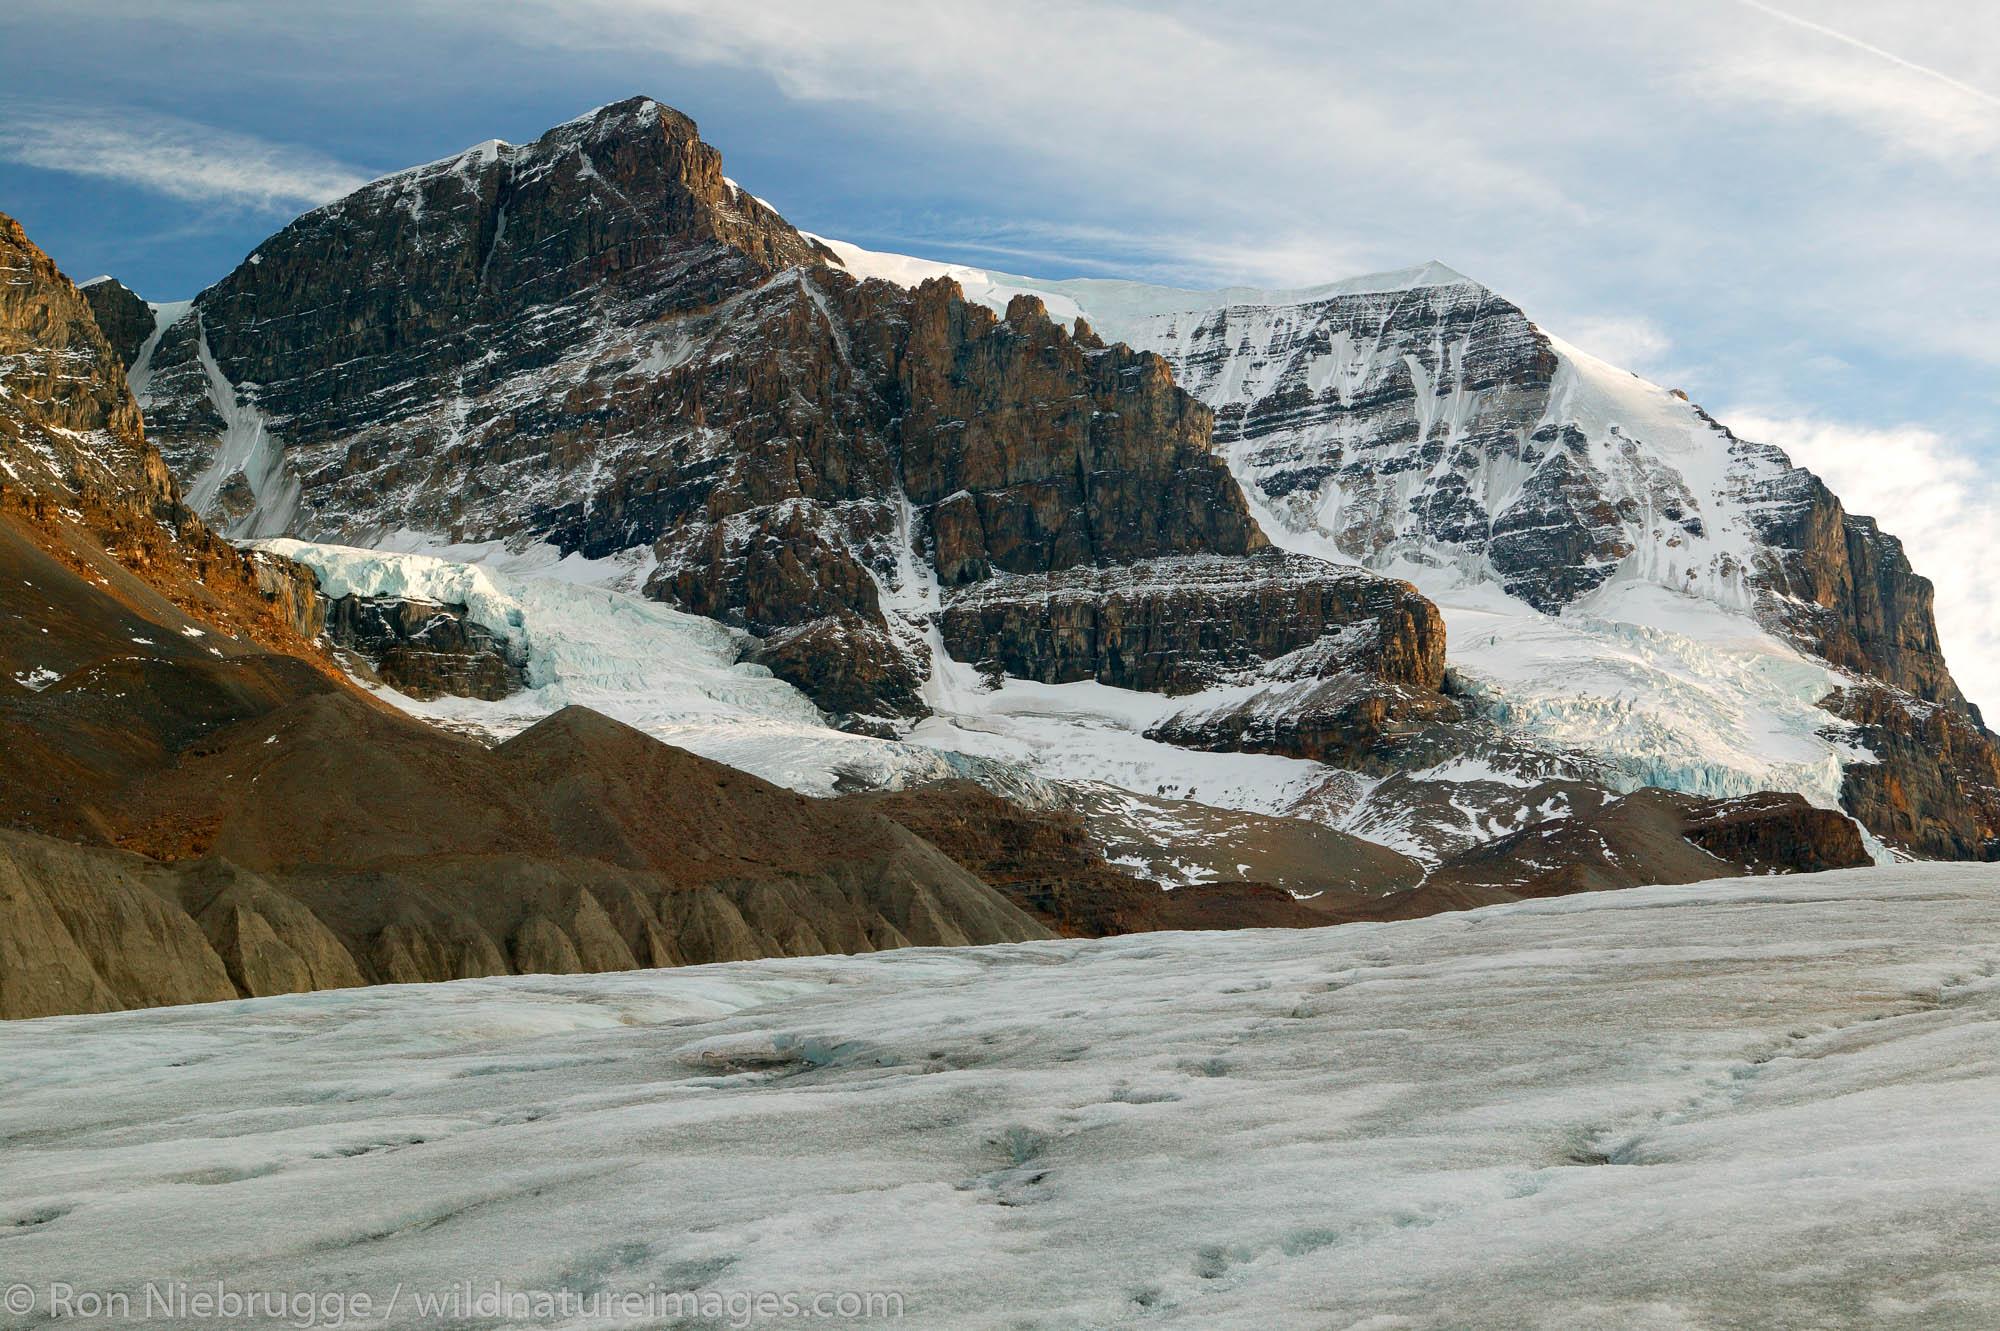 Athabasca Glacier near the Incfield Centre, Jasper National Park, Alberta, Canada.